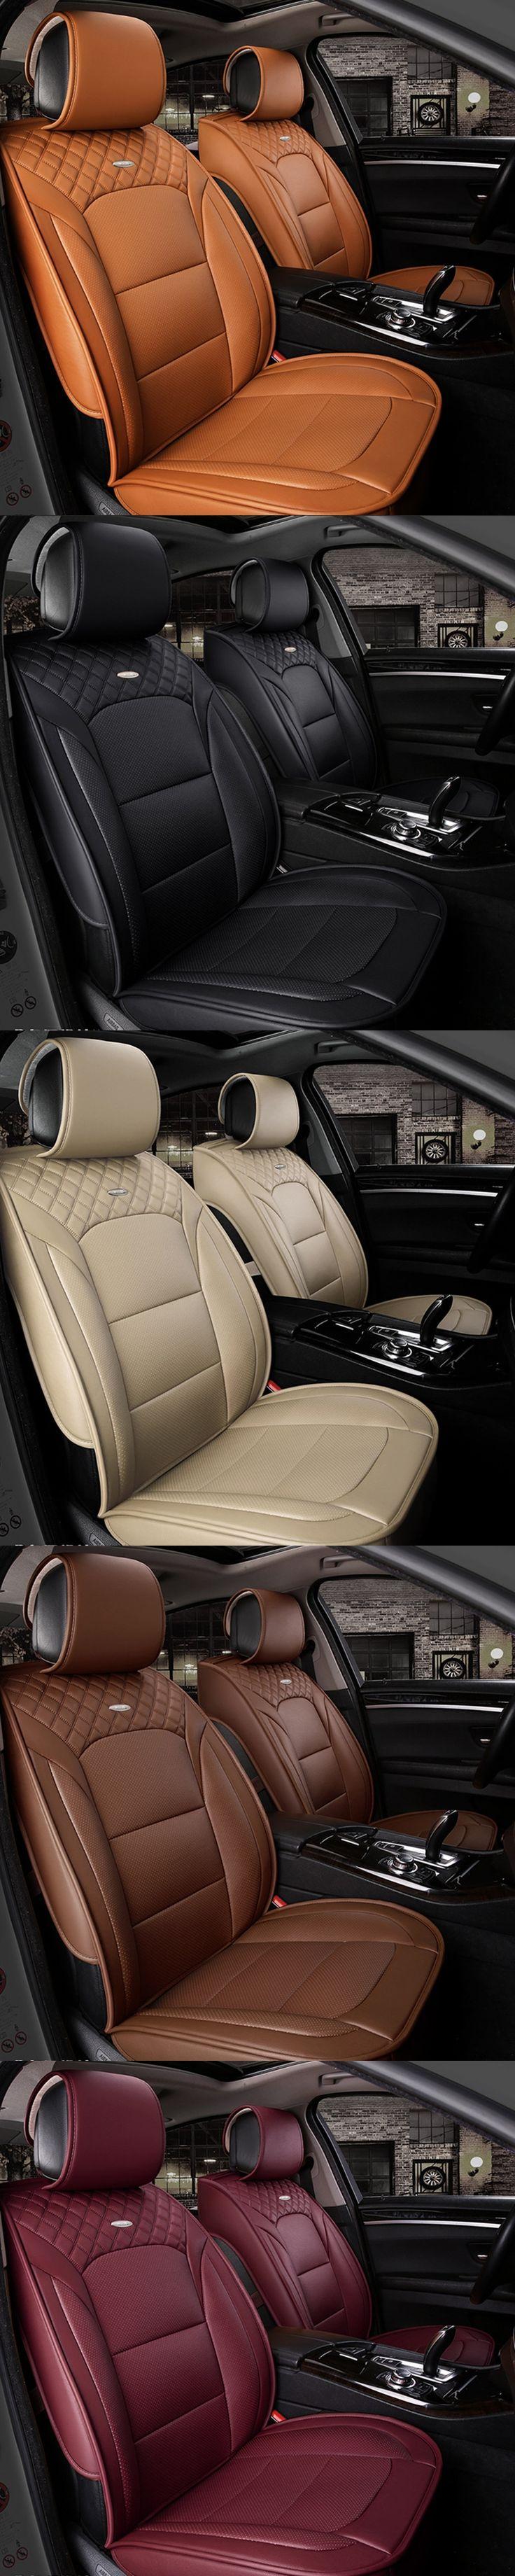 Car seat cushion thickening piece set four seasons general auto seat cushions,car seat cover,Car pad For Sedan SUV